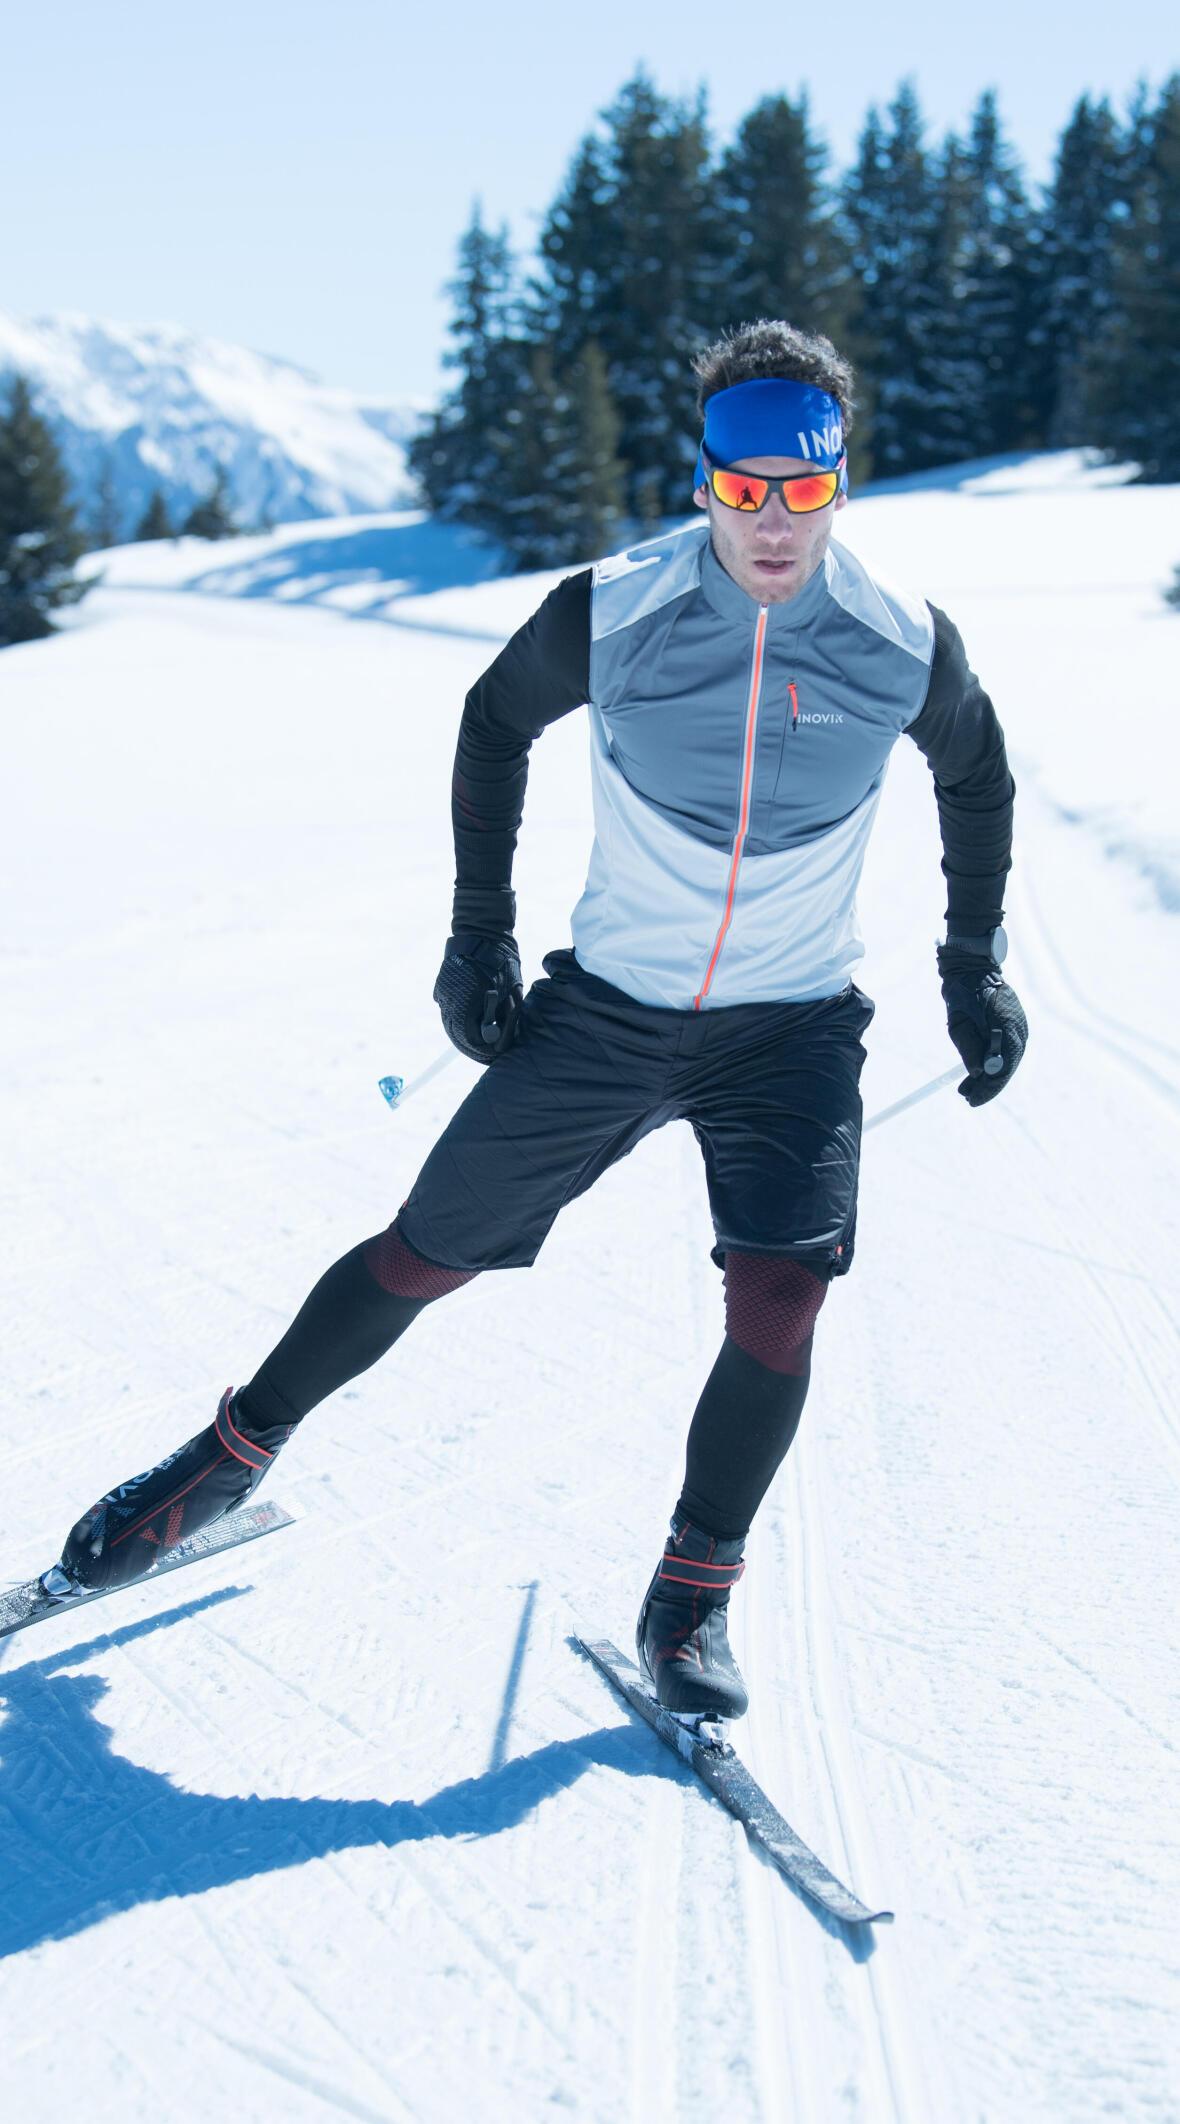 Man cross-country skiing race